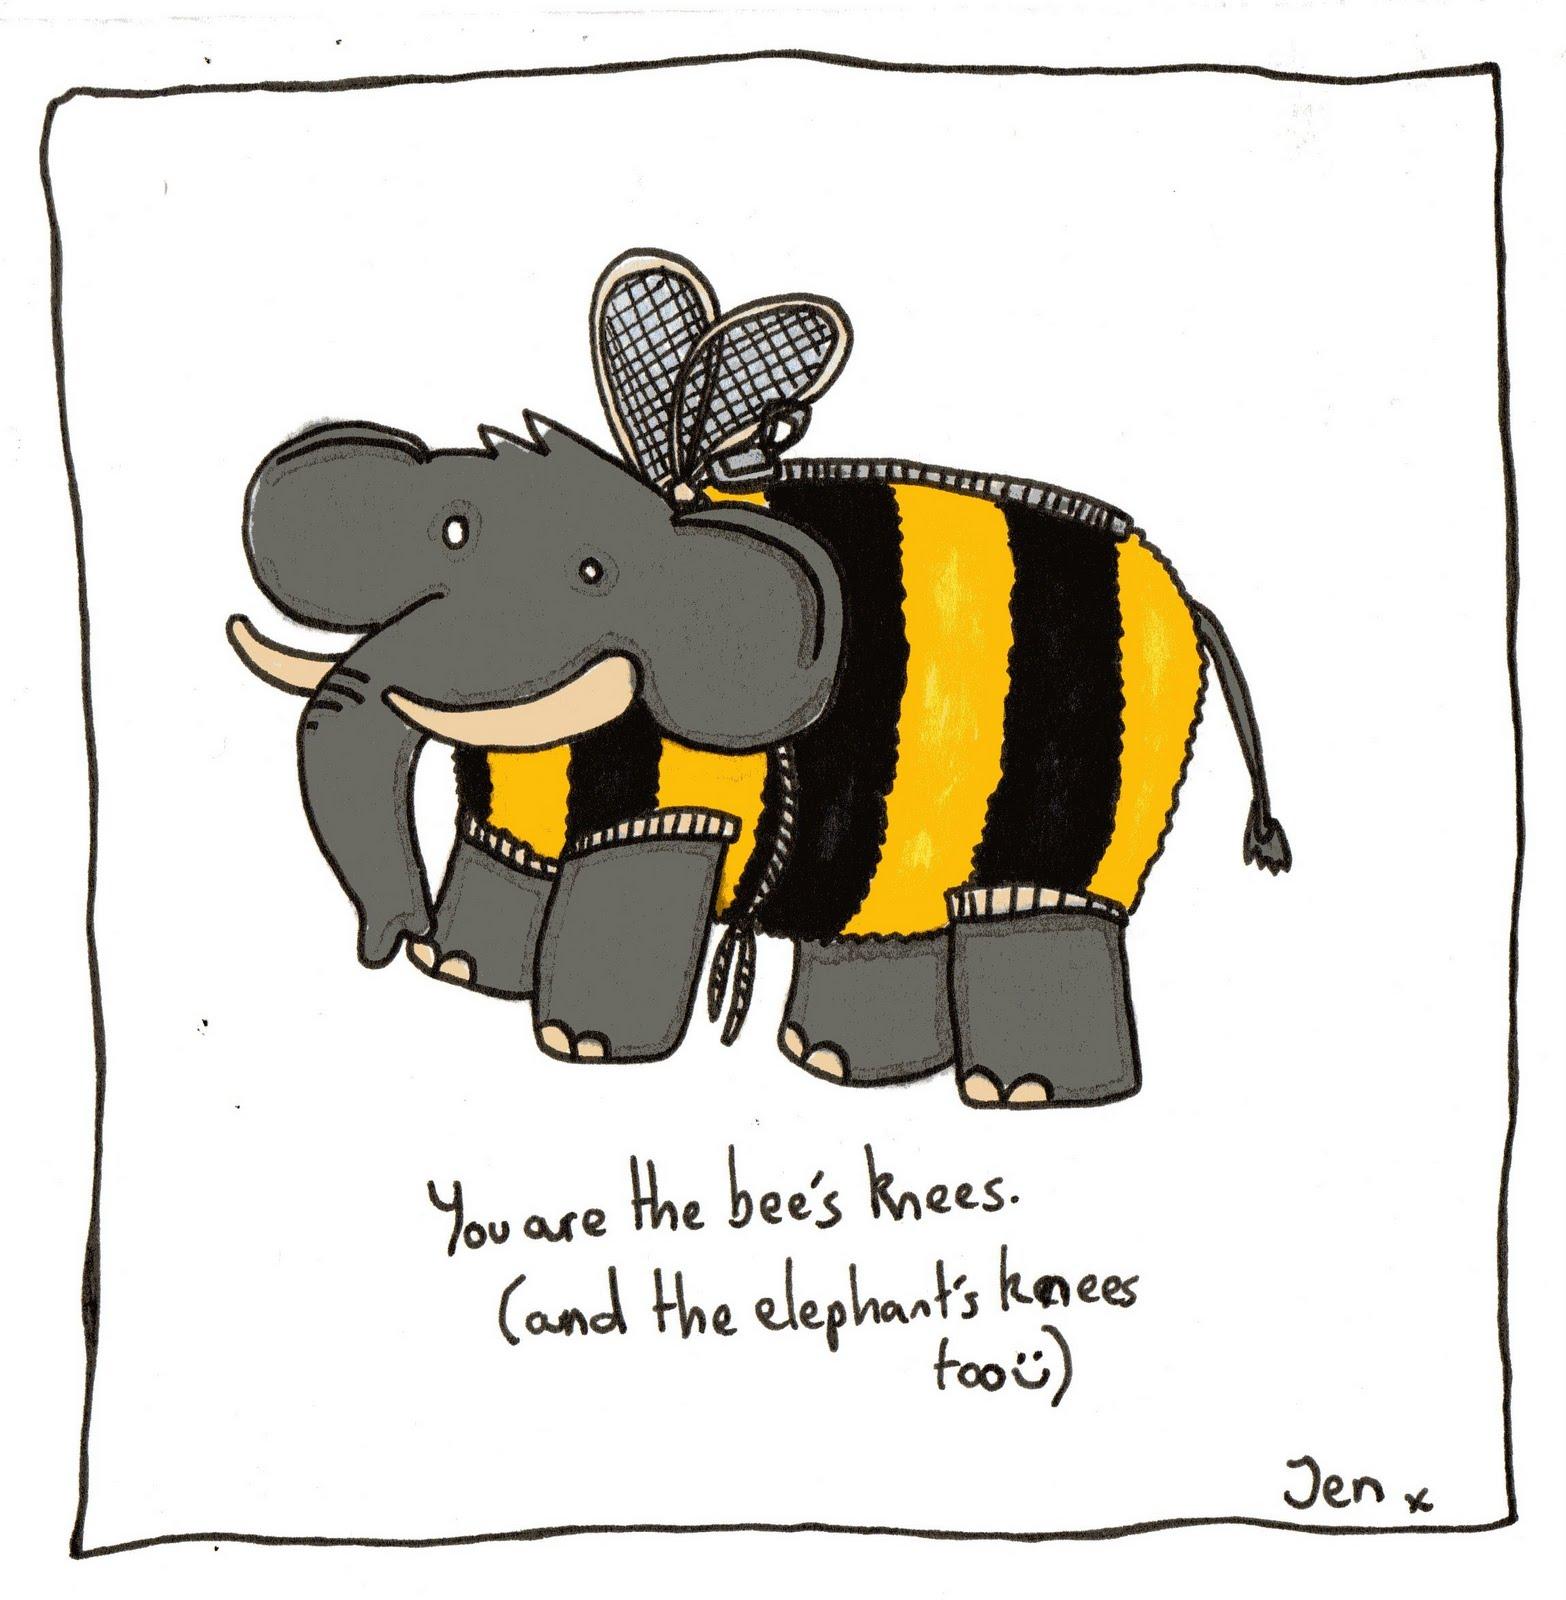 Hedgehog's Dilemma.: Beth Freeman is the Bee's Knees